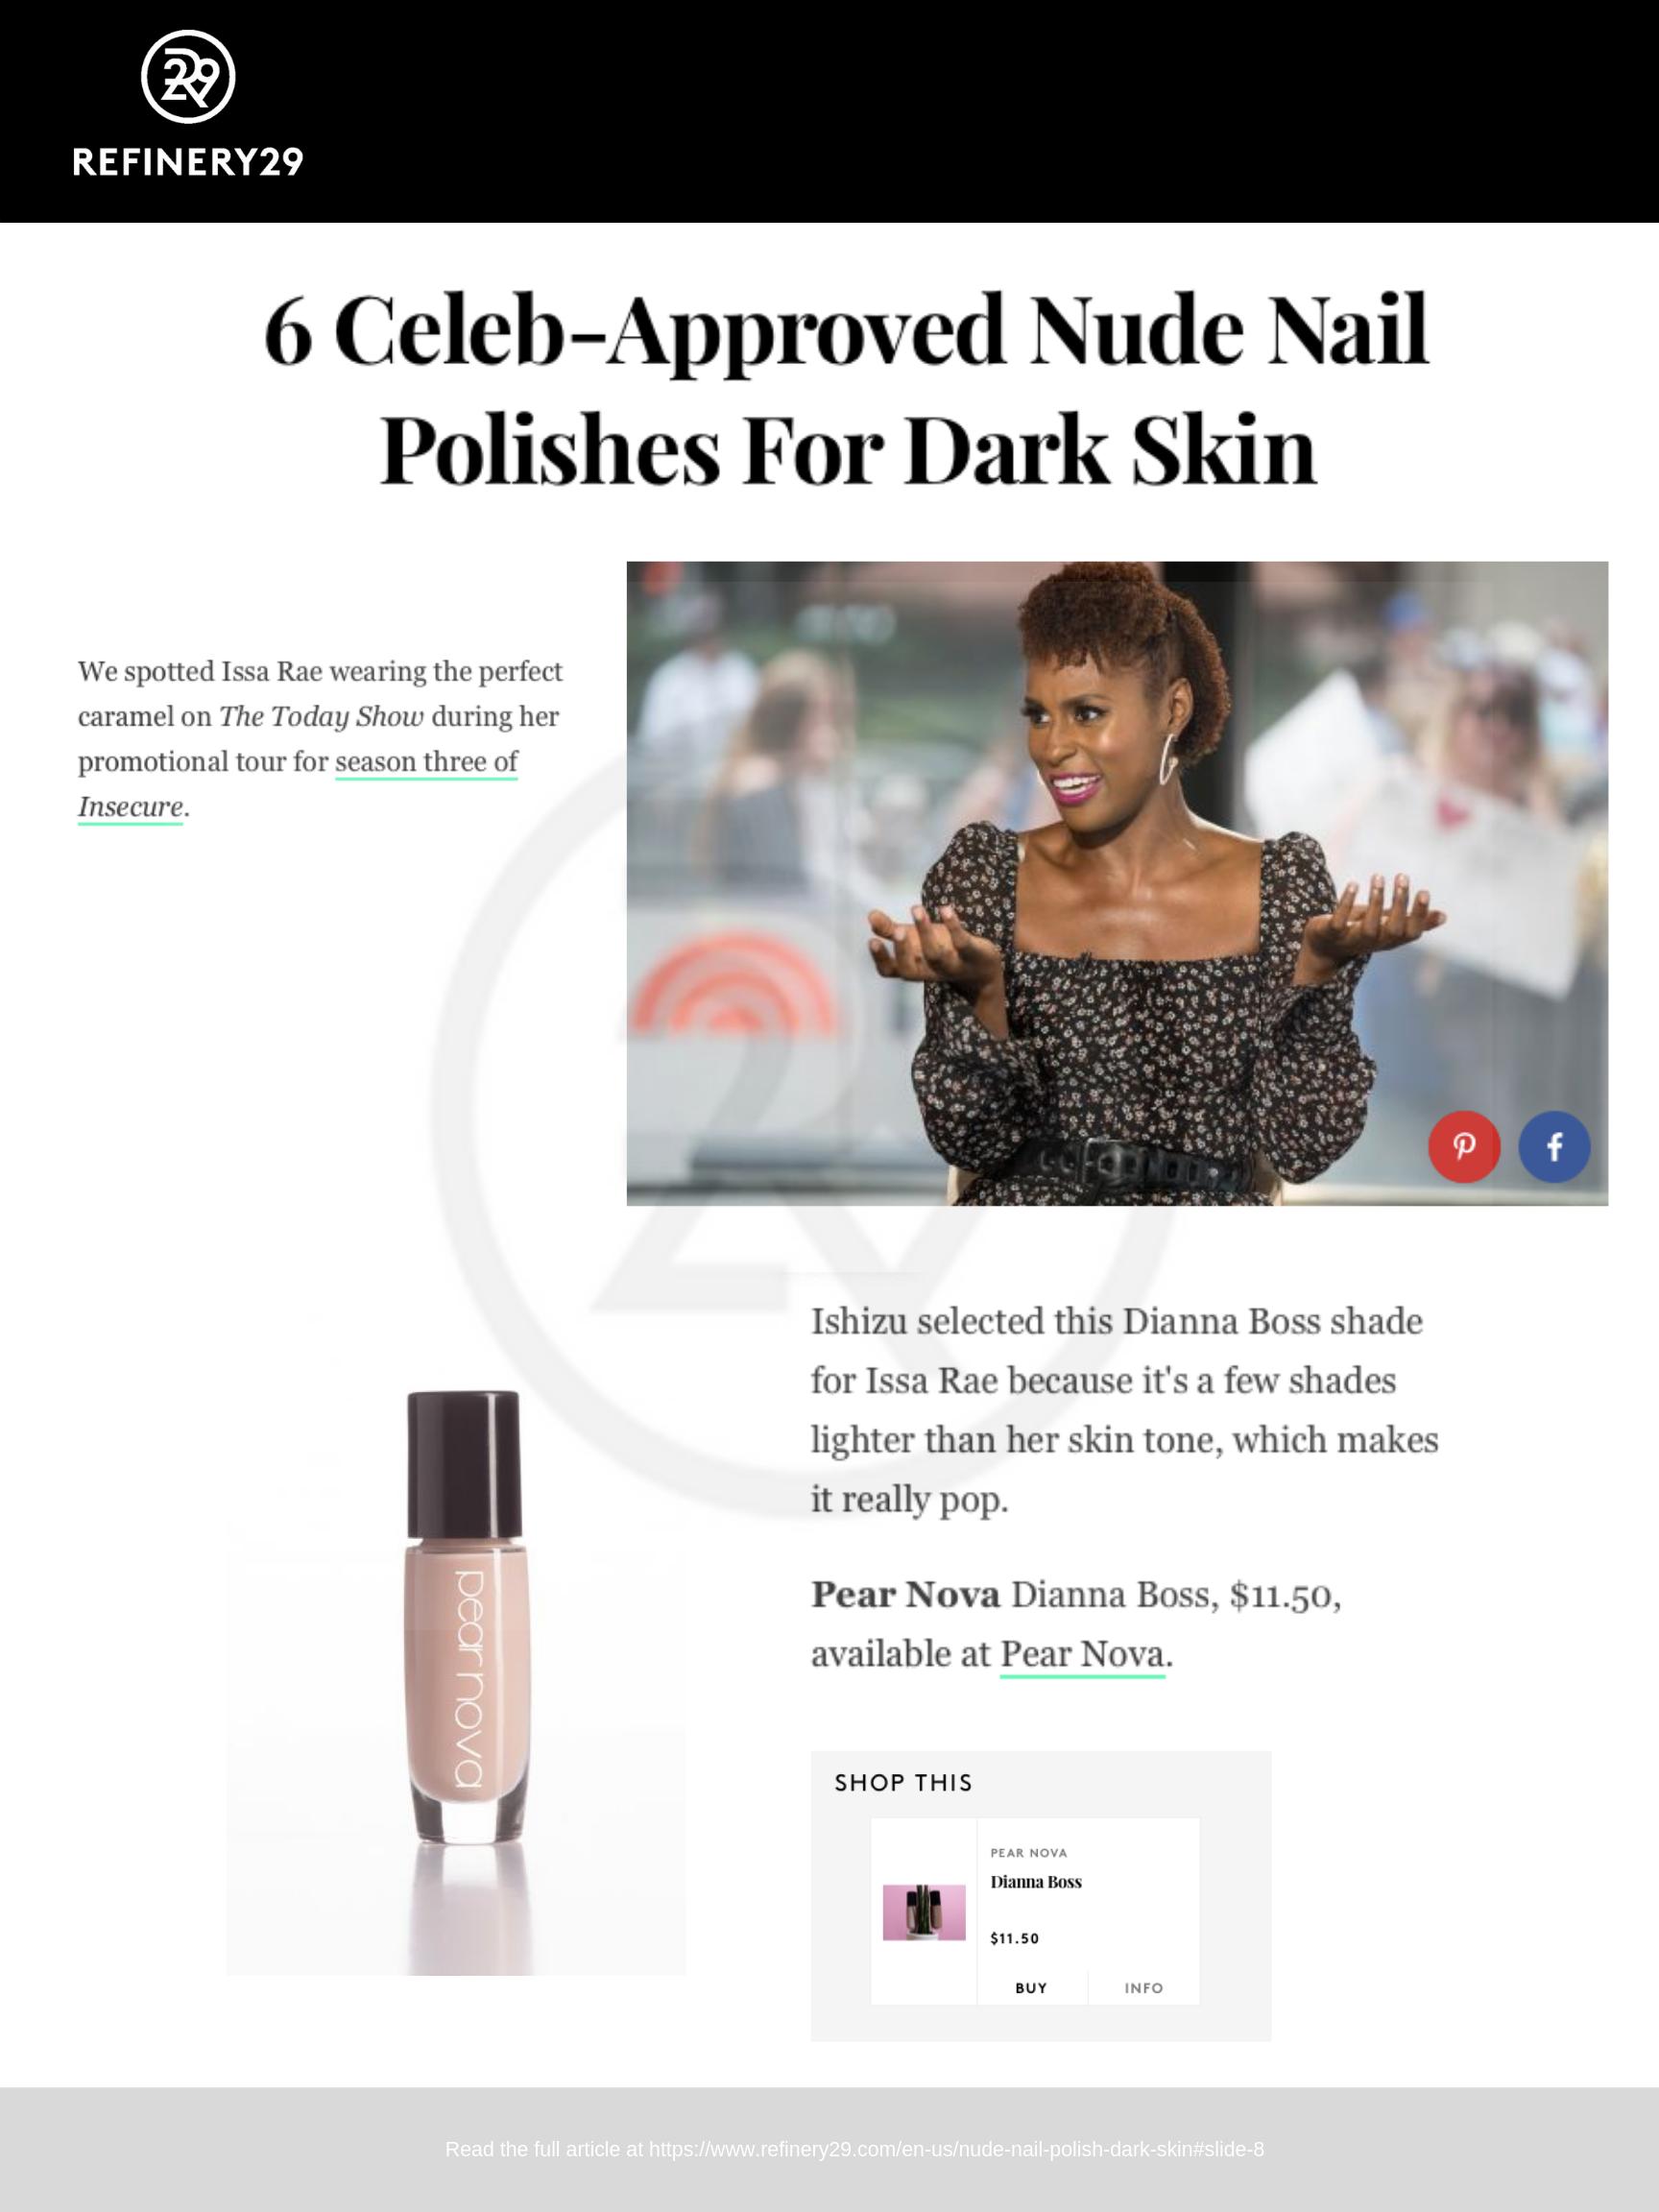 Read the full article at https___www.refinery29.com_en-us_nude-nail-polish-dark-skin#slide-8.png